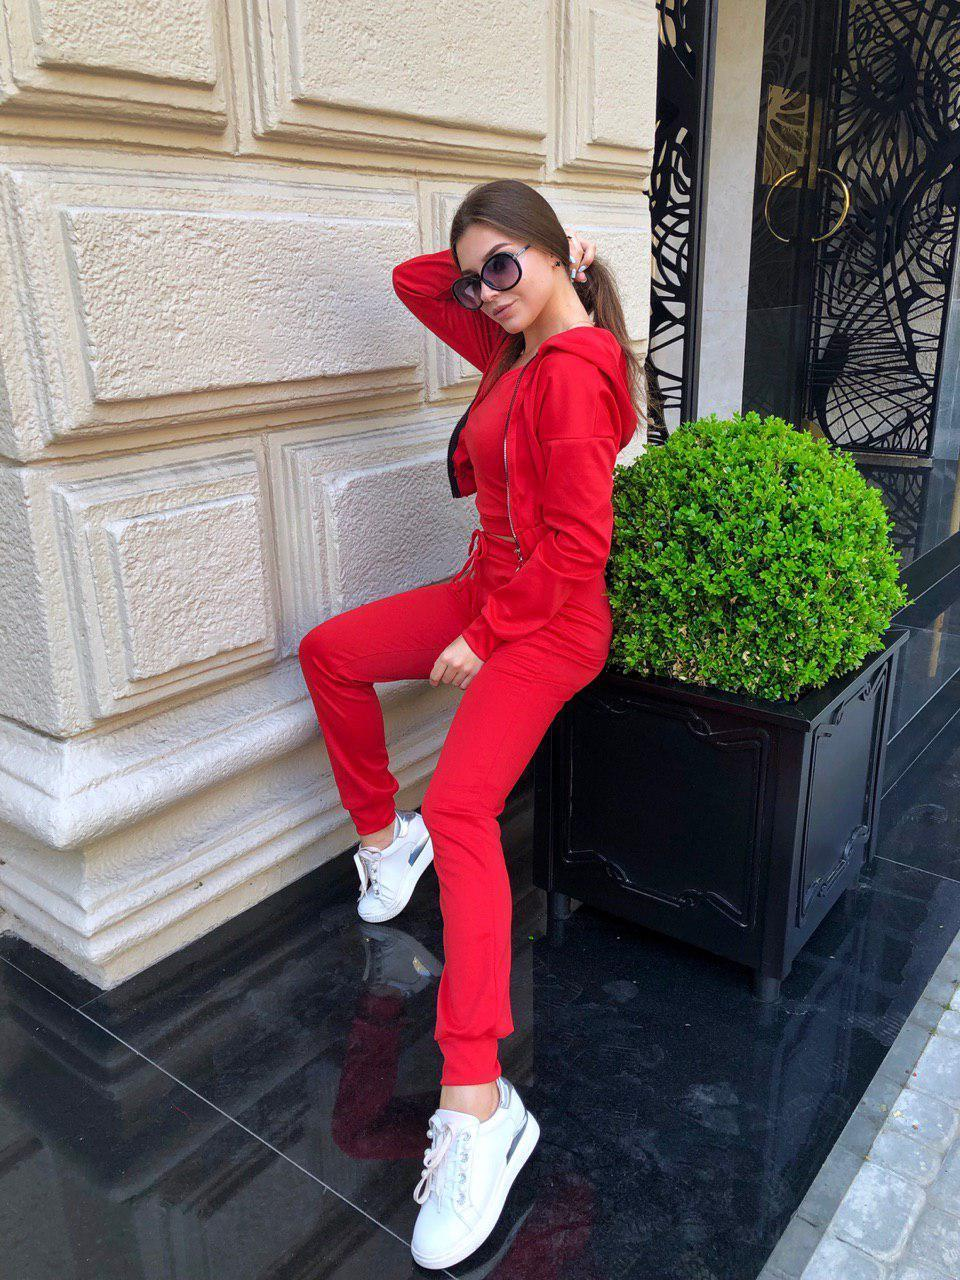 Костюм женский тройка бомбер+топ+штанытрикотаж Красный